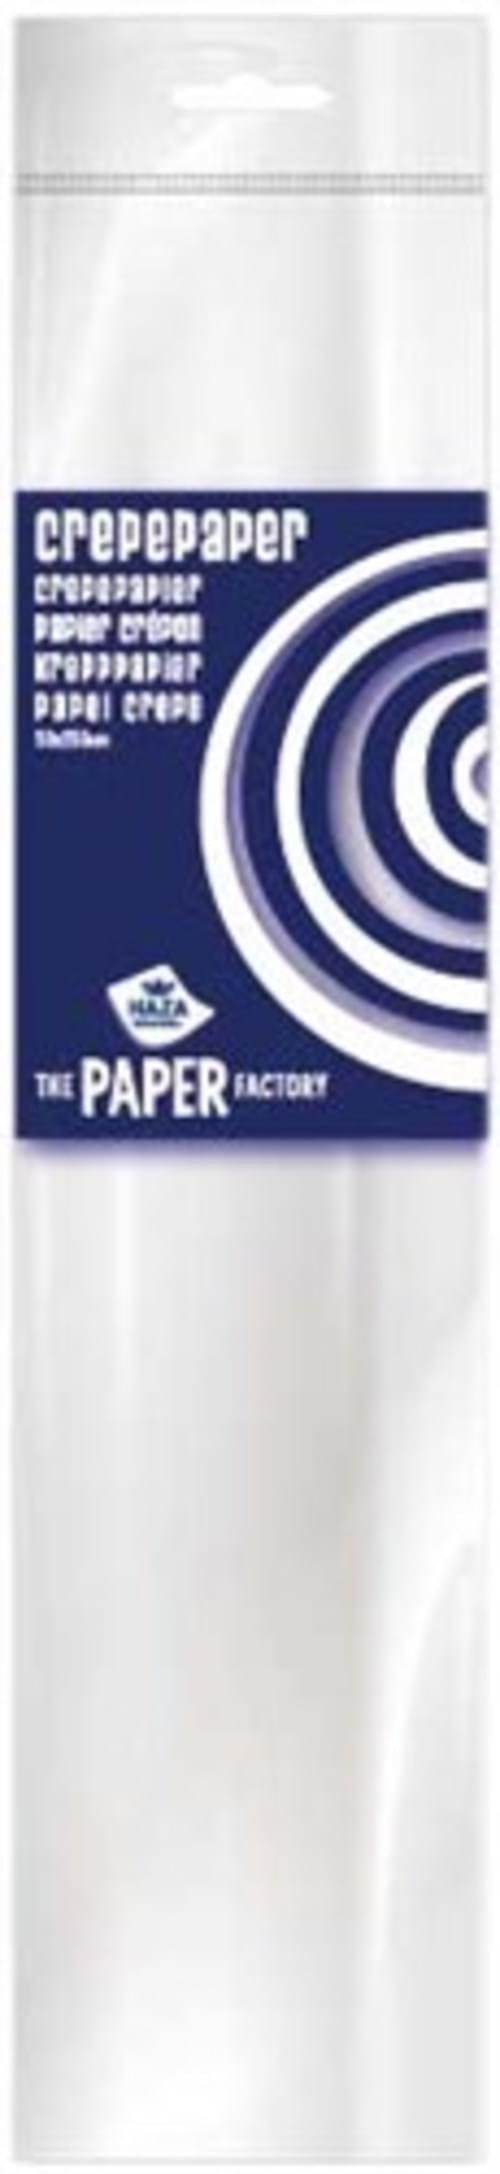 Crepe paper White 10pk